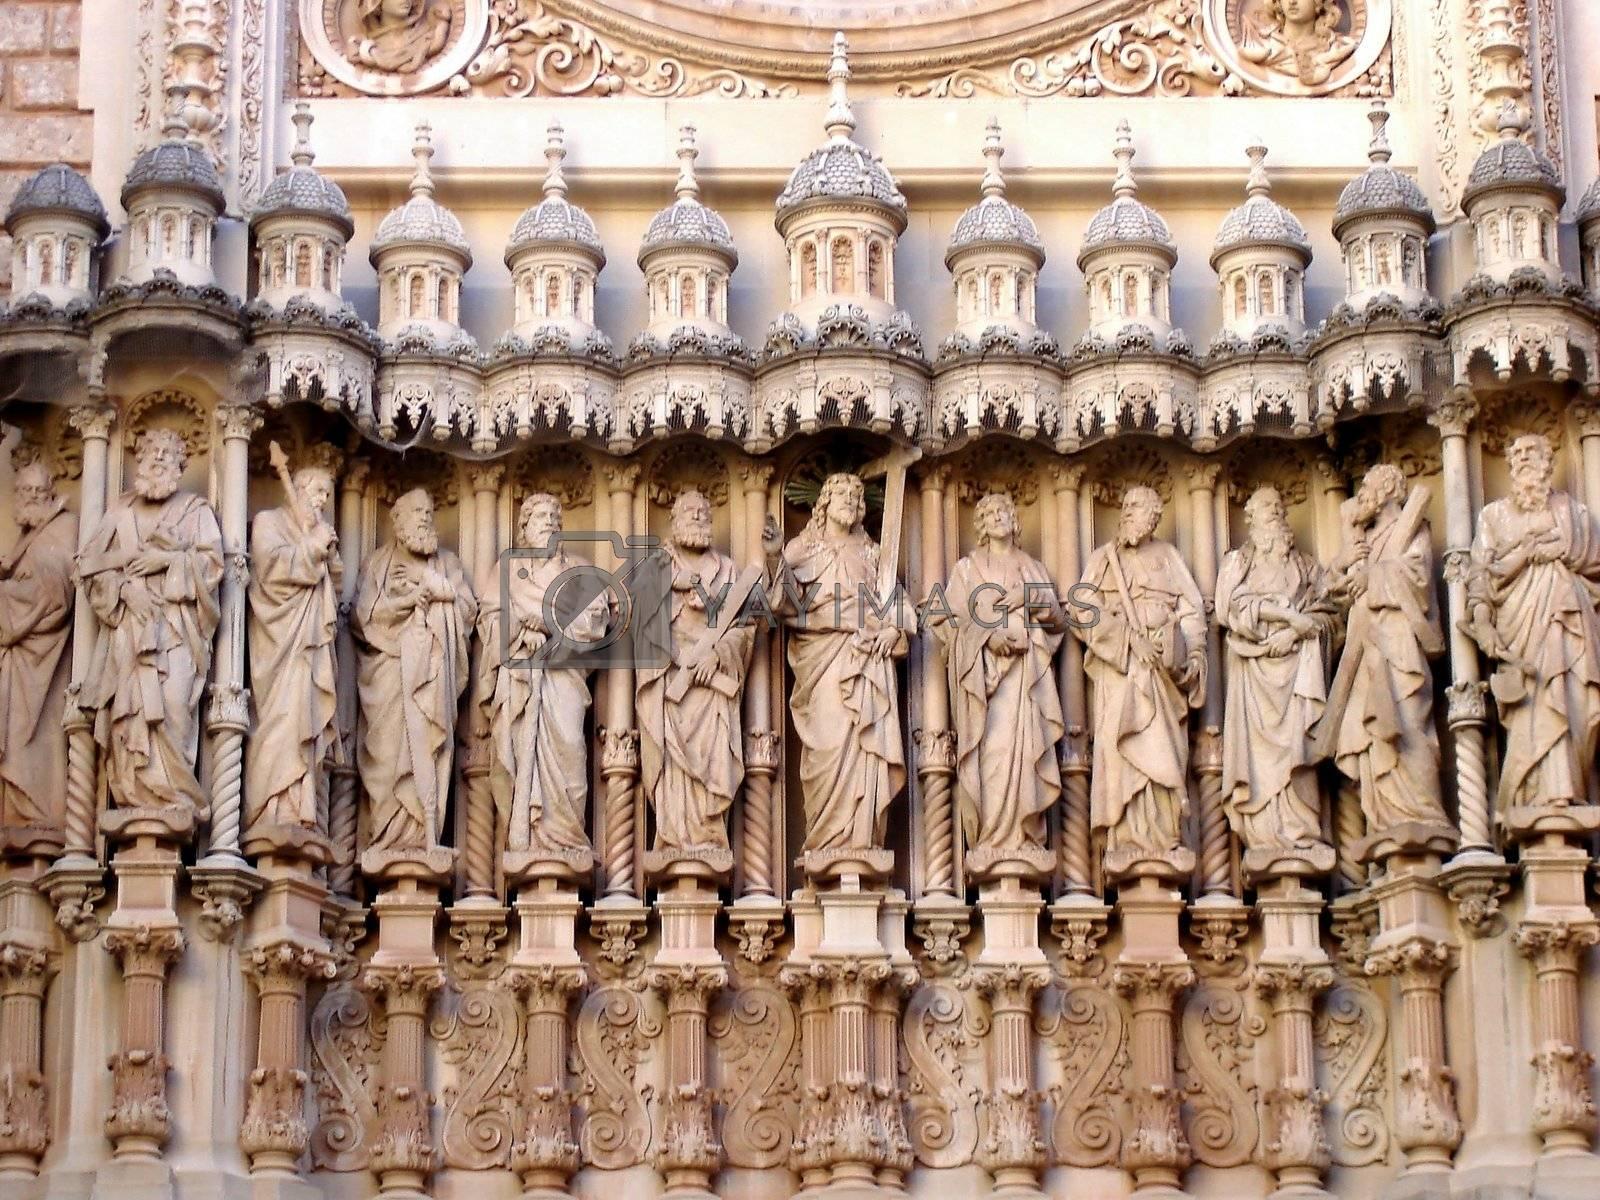 View of sculpture of the apostles outside de Sagrada Familia